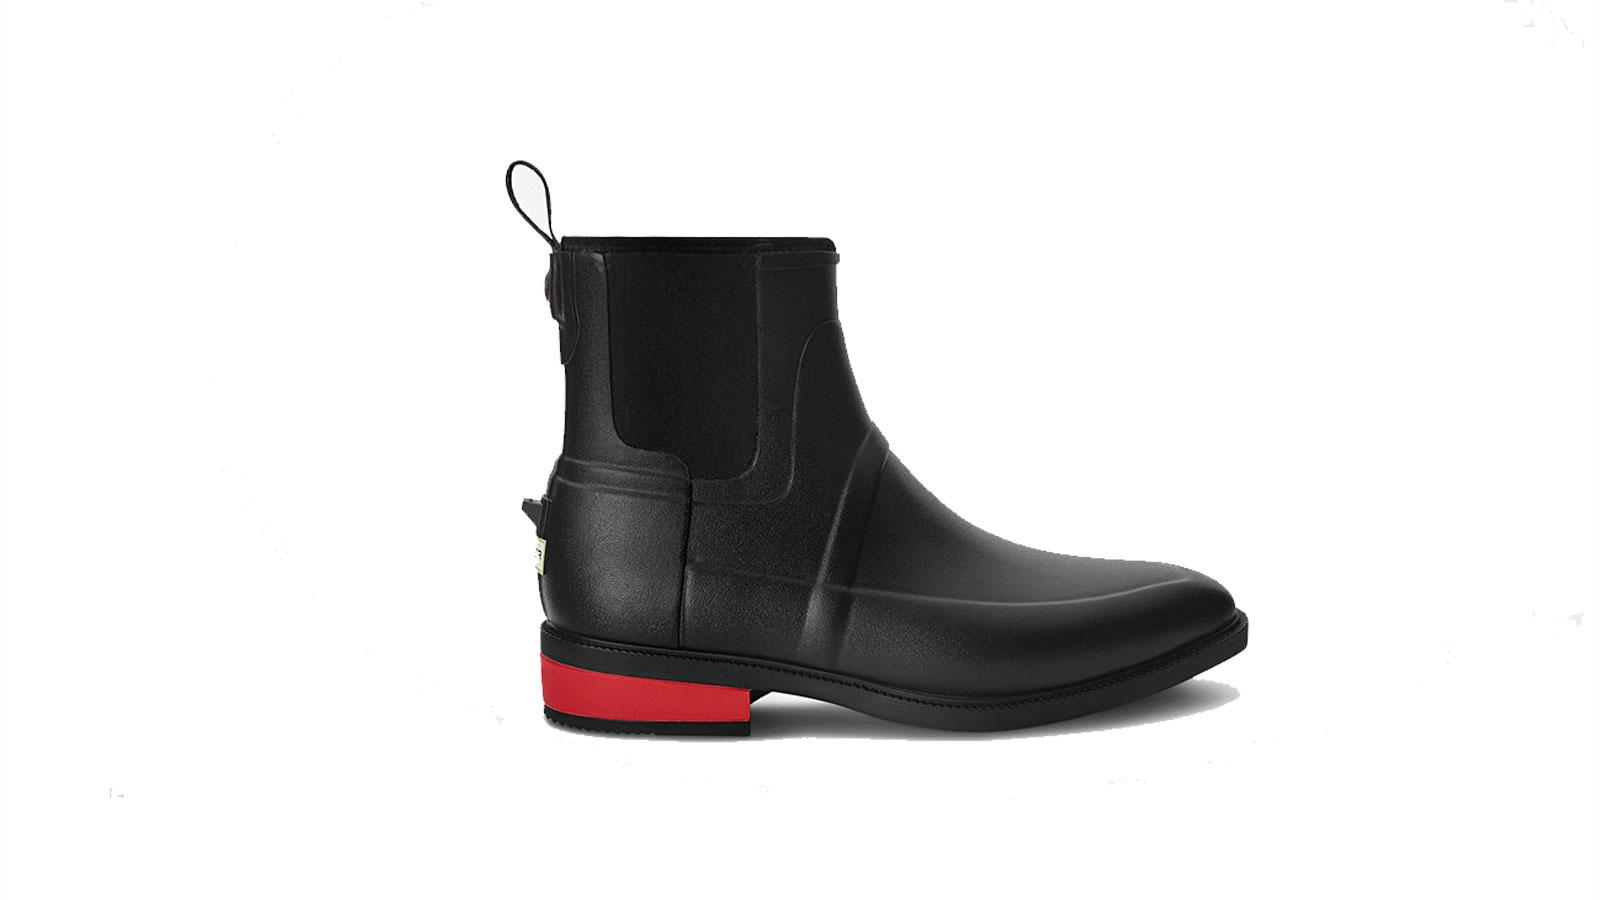 Wellesley Rubber Jodhpur Men's Waterproof Boot by Hunter | the best men's waterproof boots